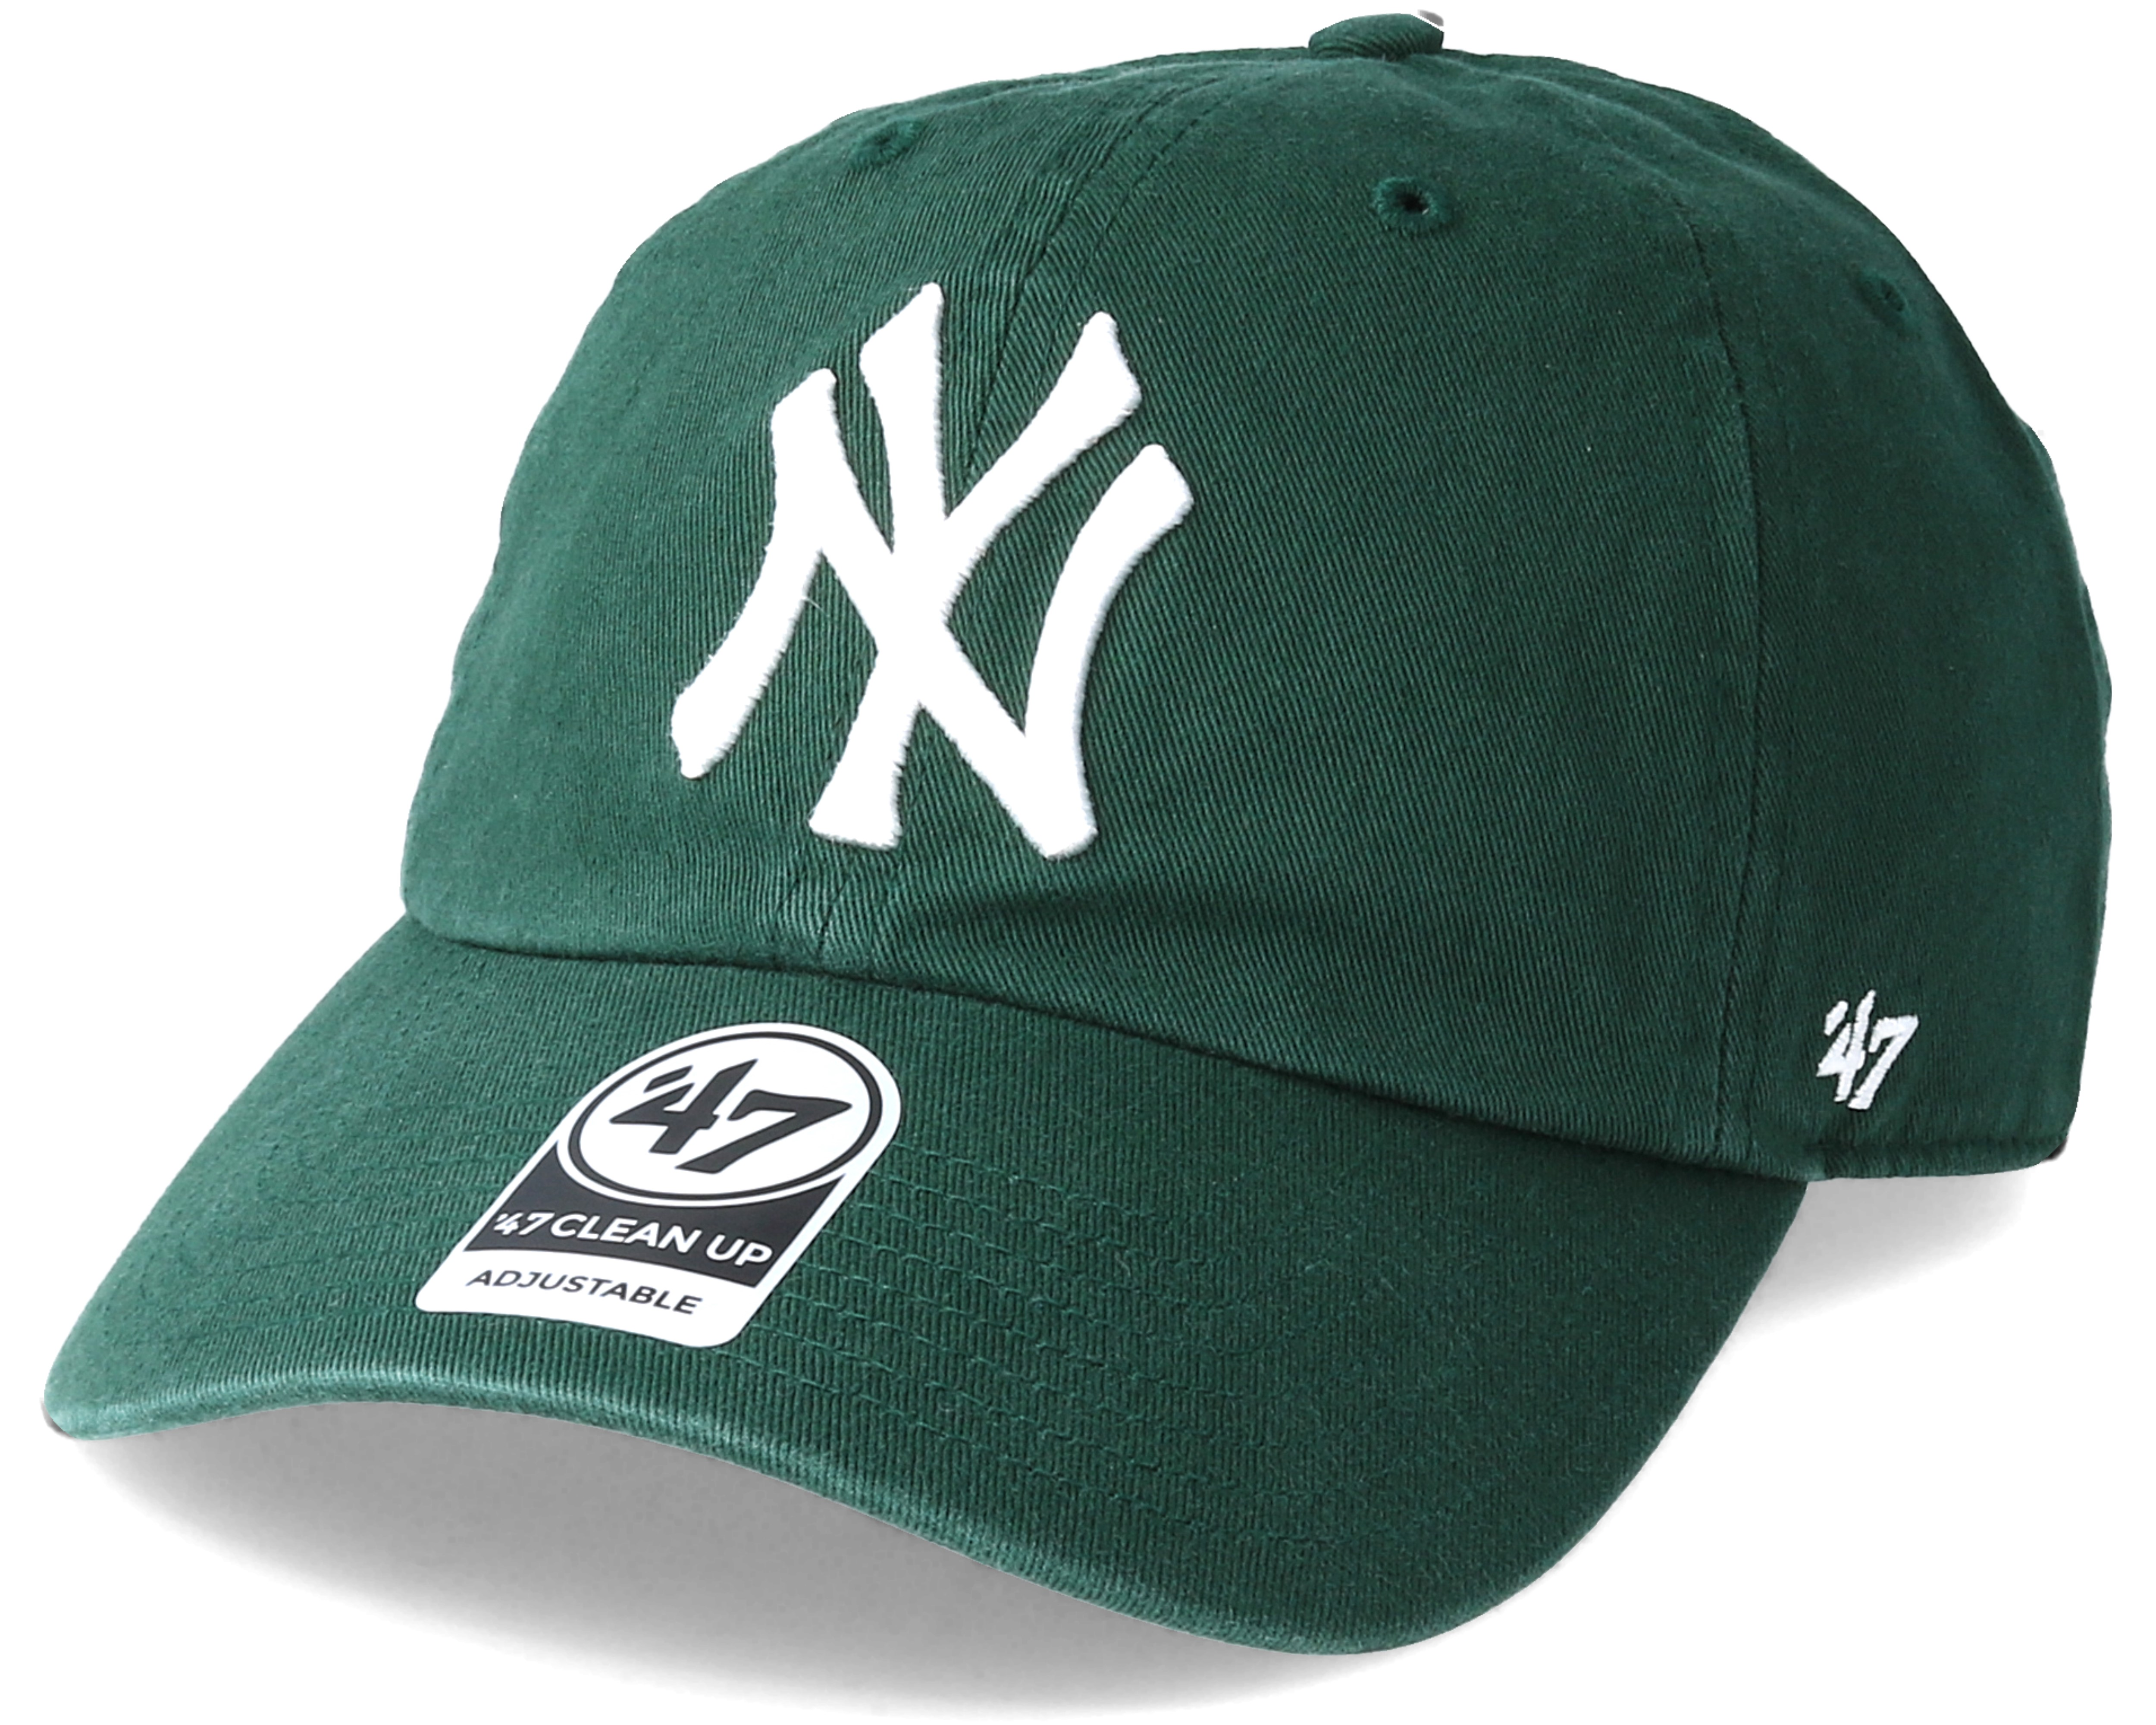 half off b9ecc 66554 New york yankees store online / Free things to do in ...